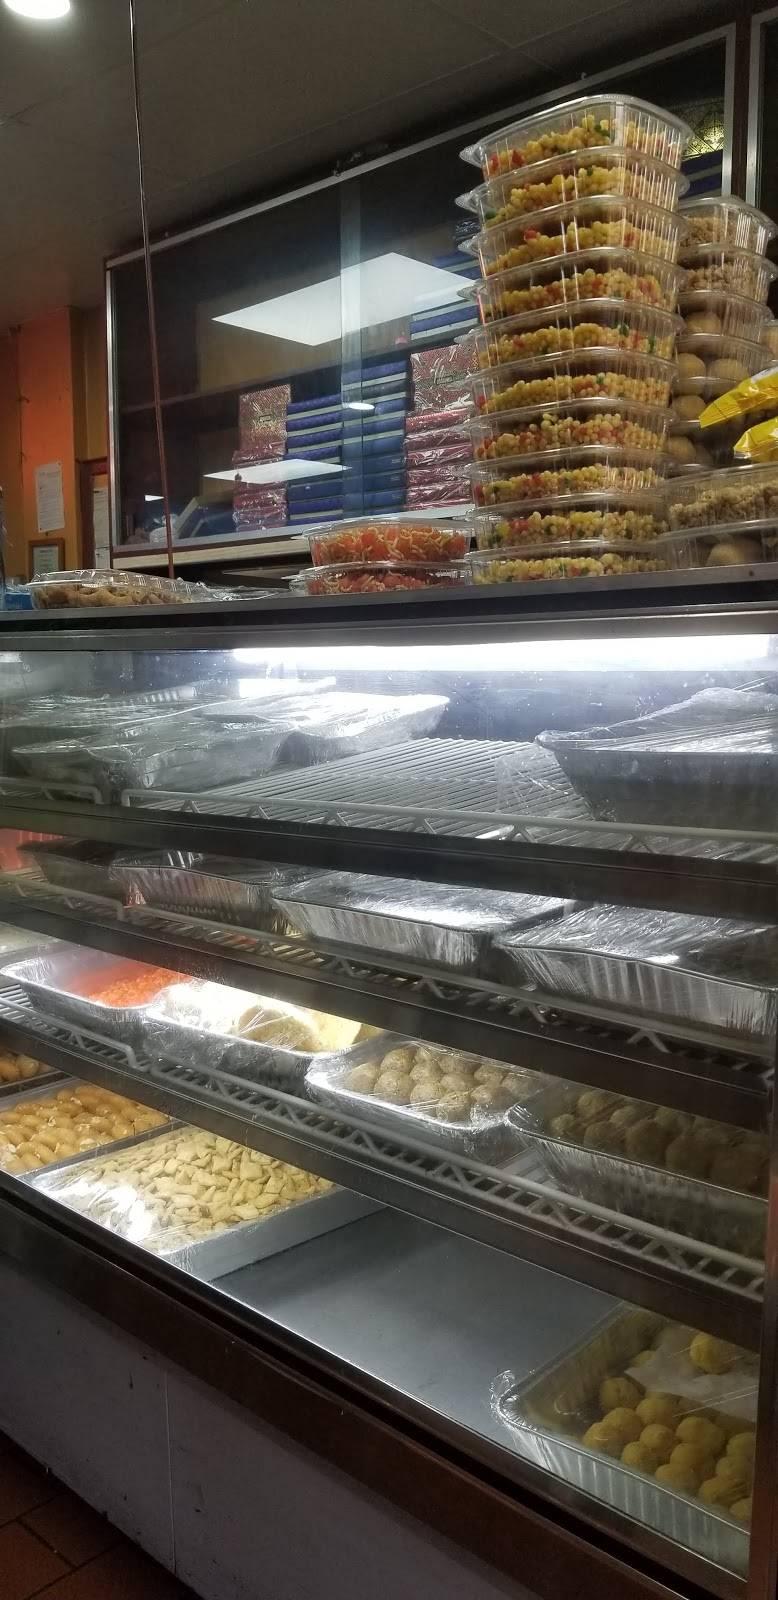 SK Sweets   restaurant   13018 Rockaway Blvd, South Ozone Park, NY 11420, USA   7188489800 OR +1 718-848-9800